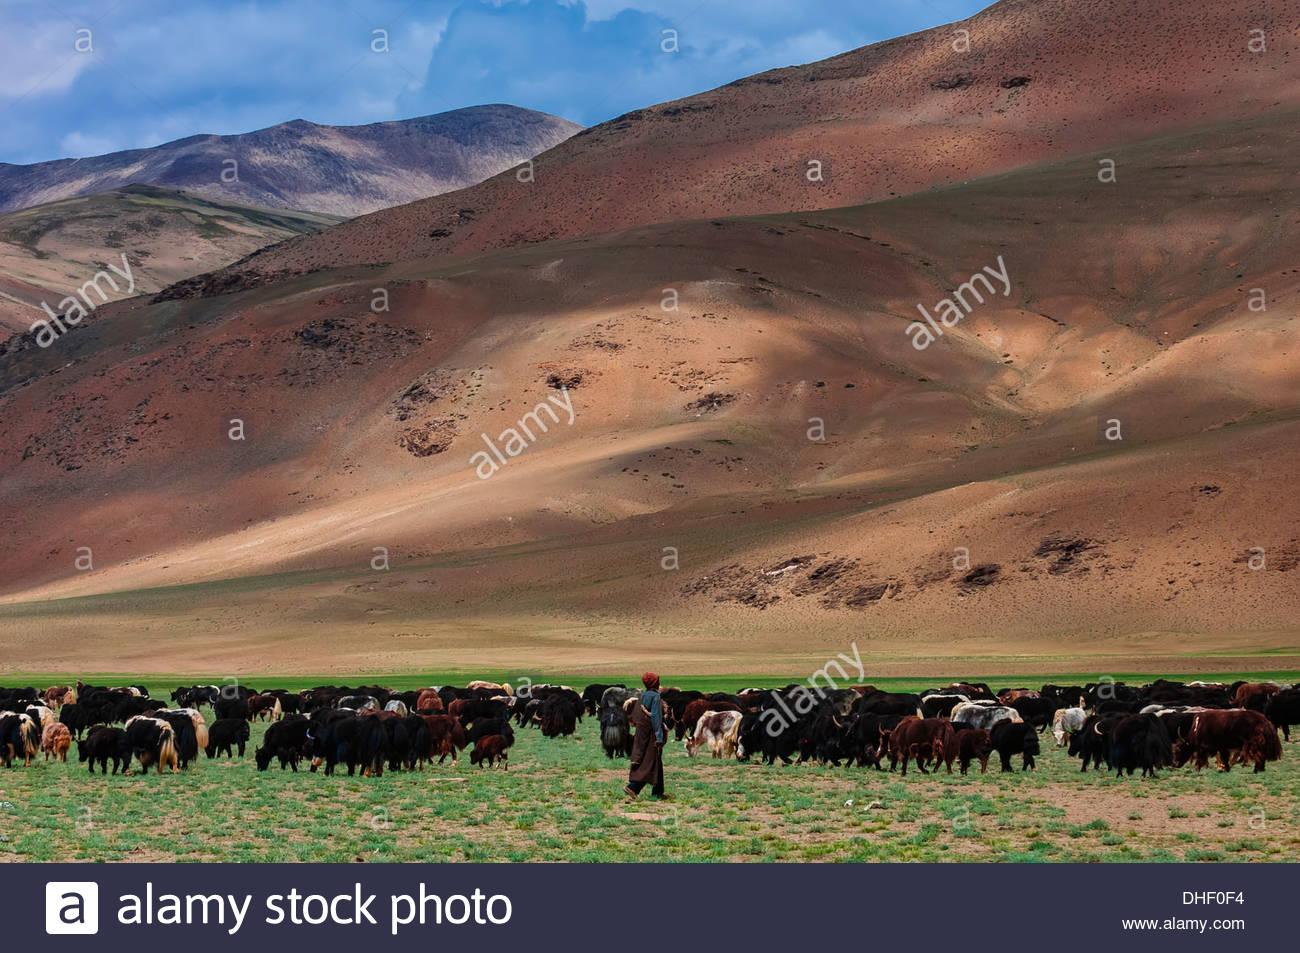 Nomadic Yak herders in the Himalayas, near Pang, Ladakh, Jammu and Kashmir State, India. - Stock Image